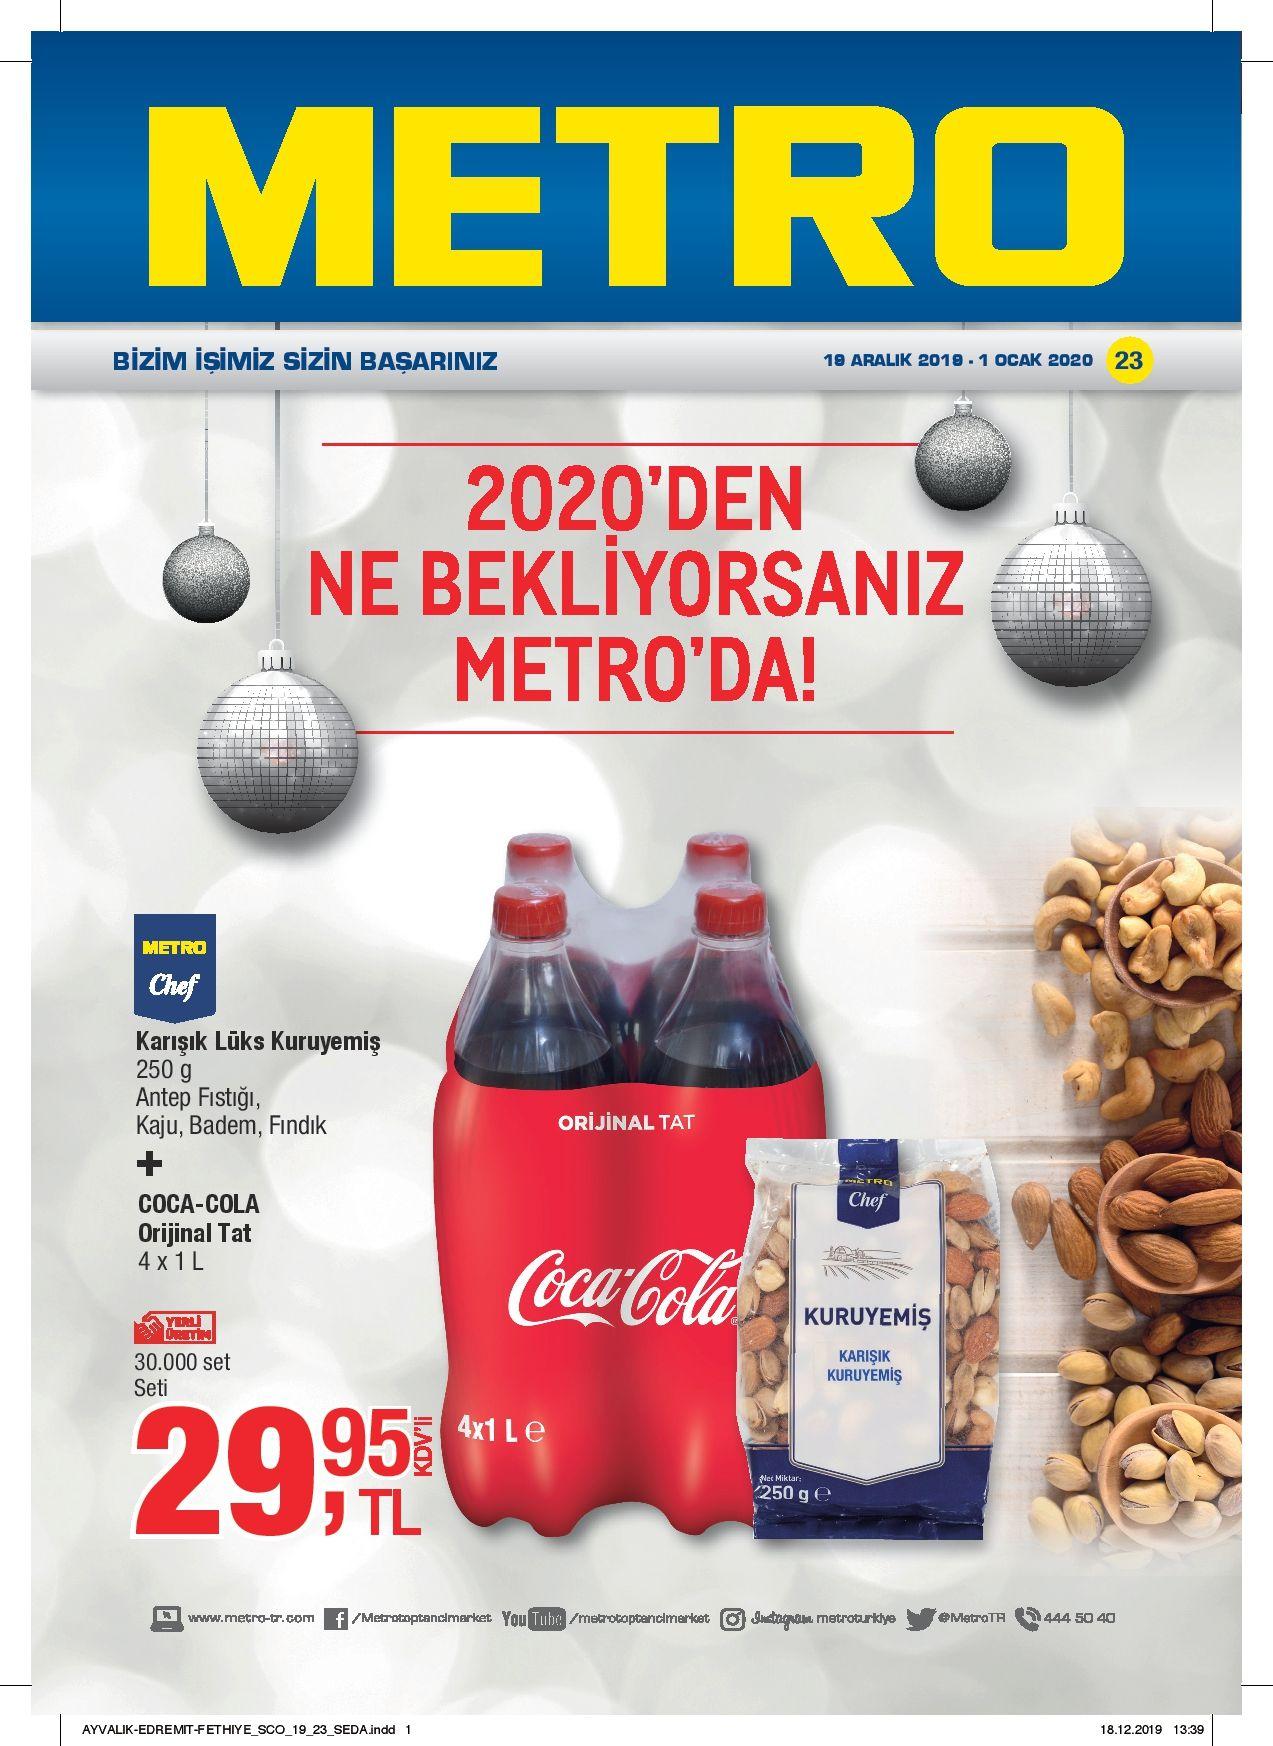 Metro Aktuel Urunler Katalogu 19 Aralik 2019 1 Ocak 2020 Ayvalik Edremit Fethiye Indirim Ka Gida Guvenligi Urunler Ocak